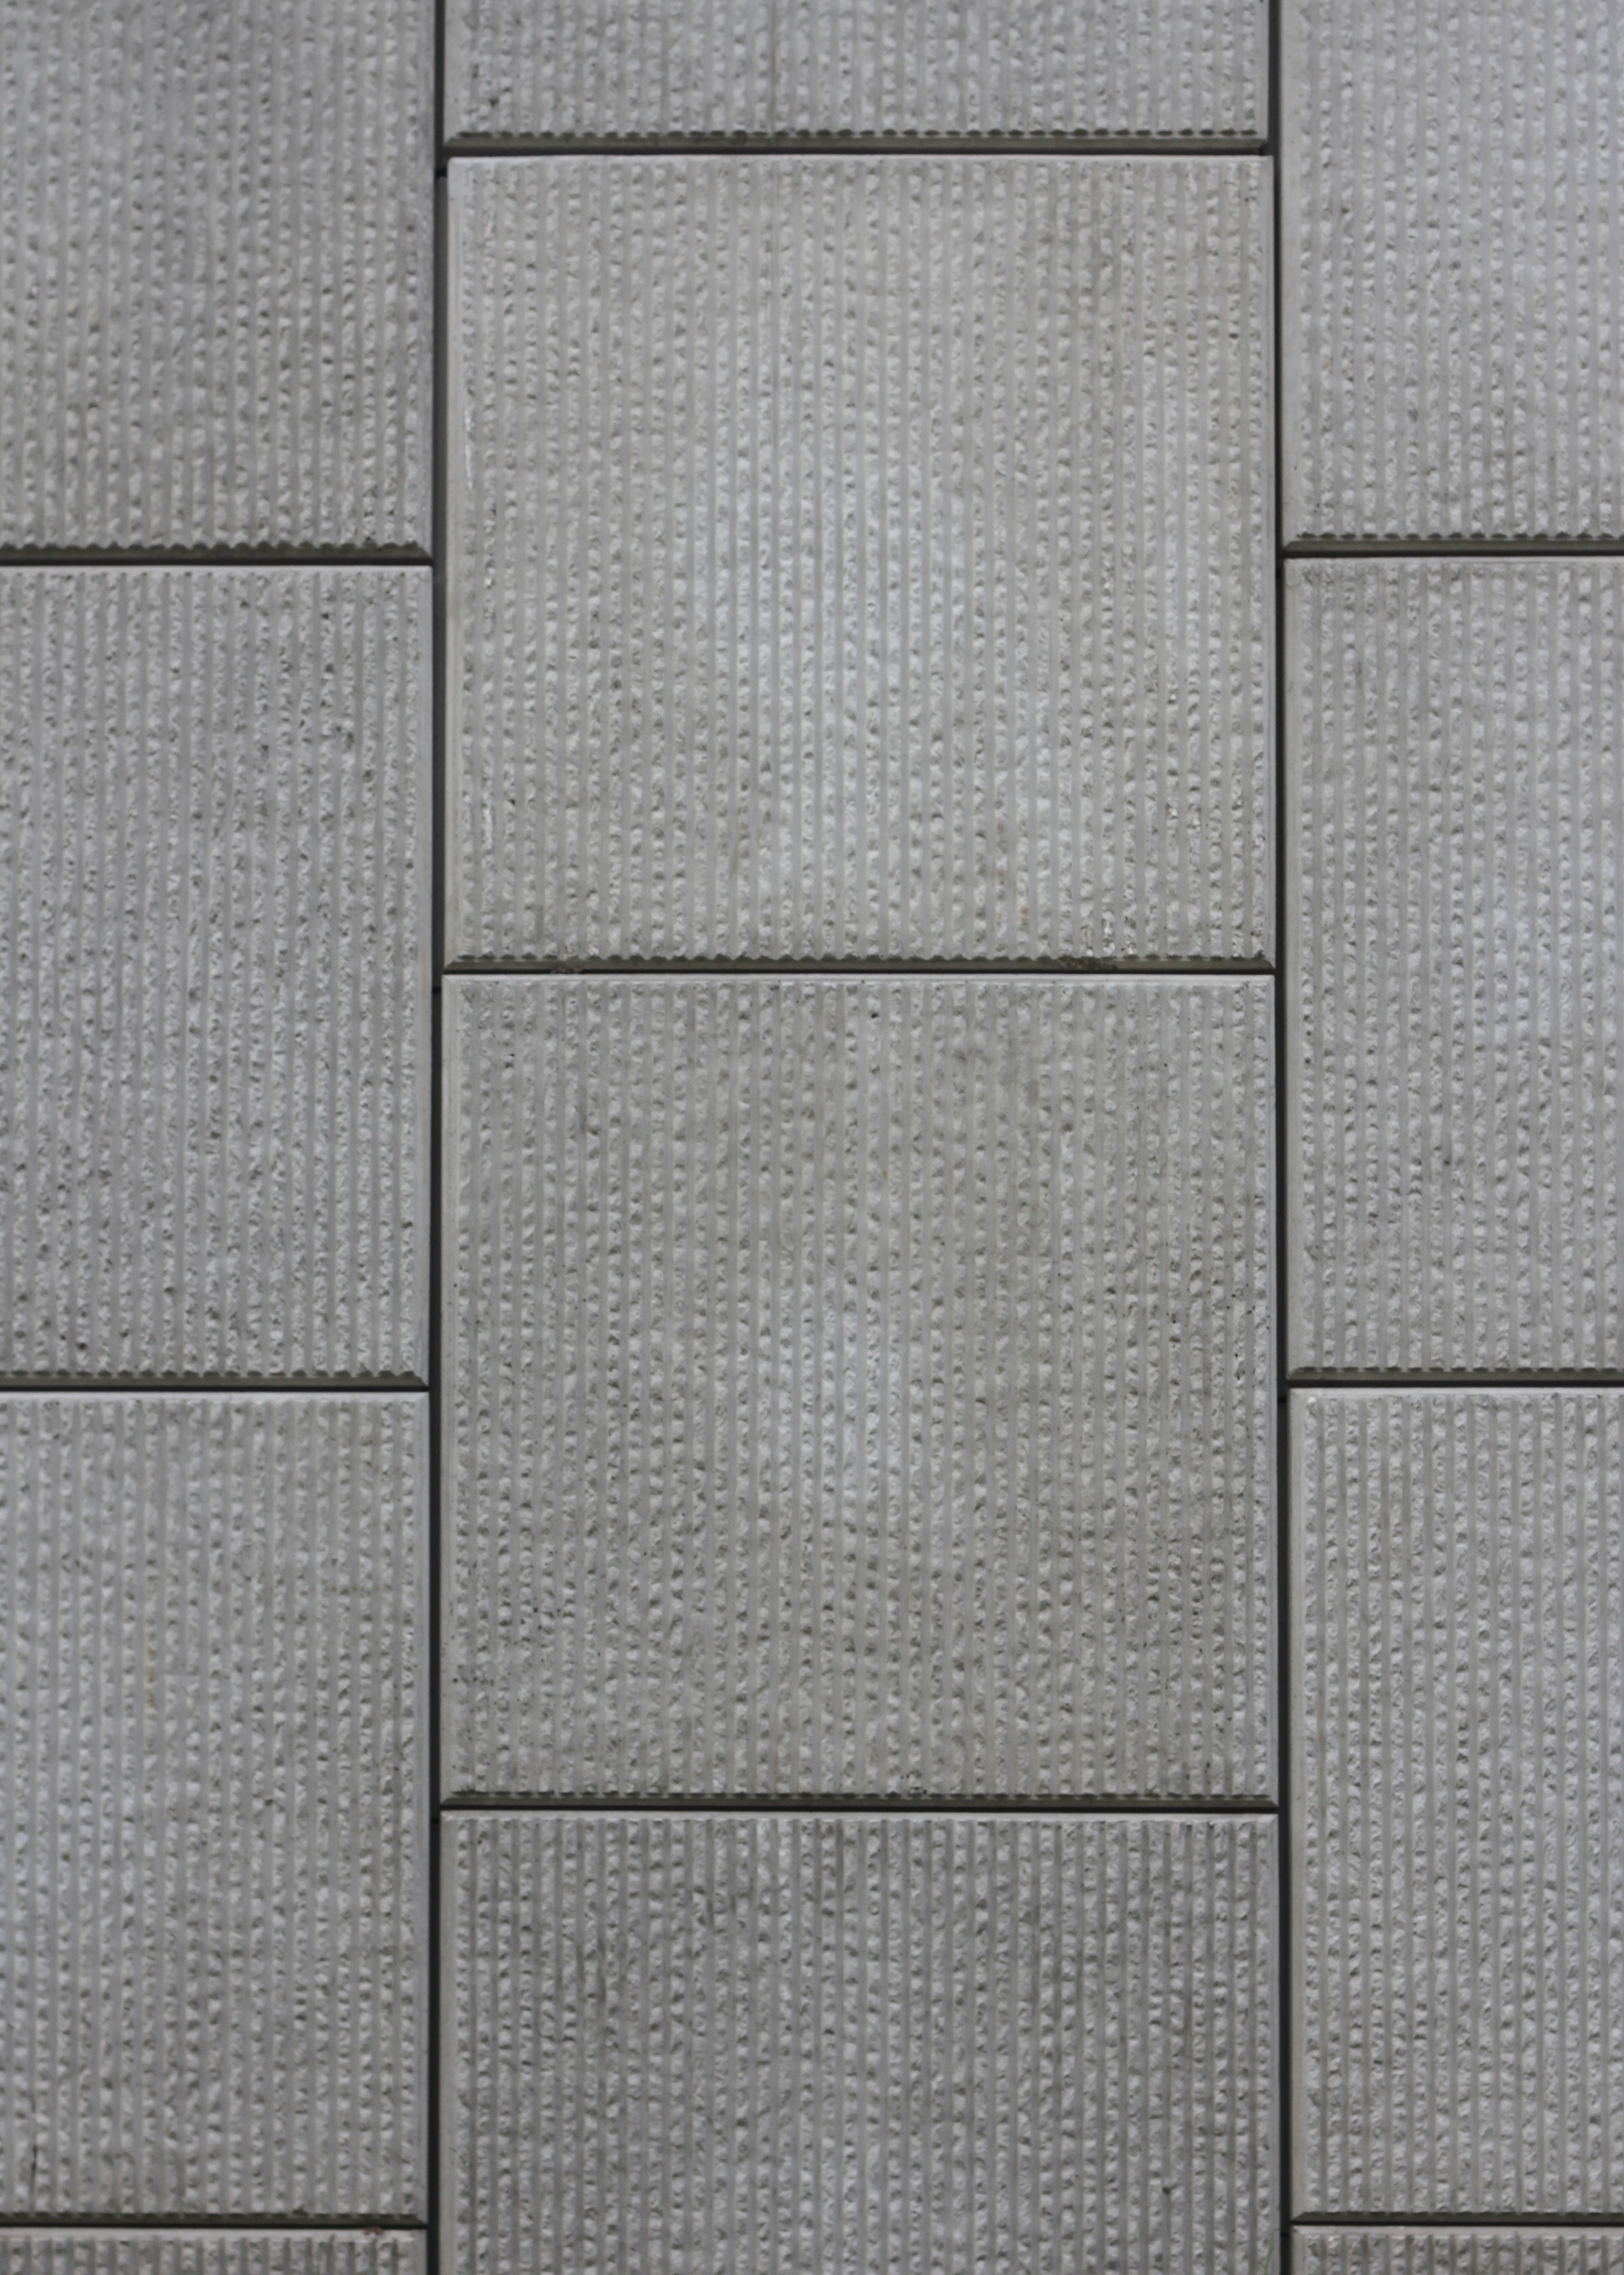 Concrete Retaining Wall Textures - 14Textures